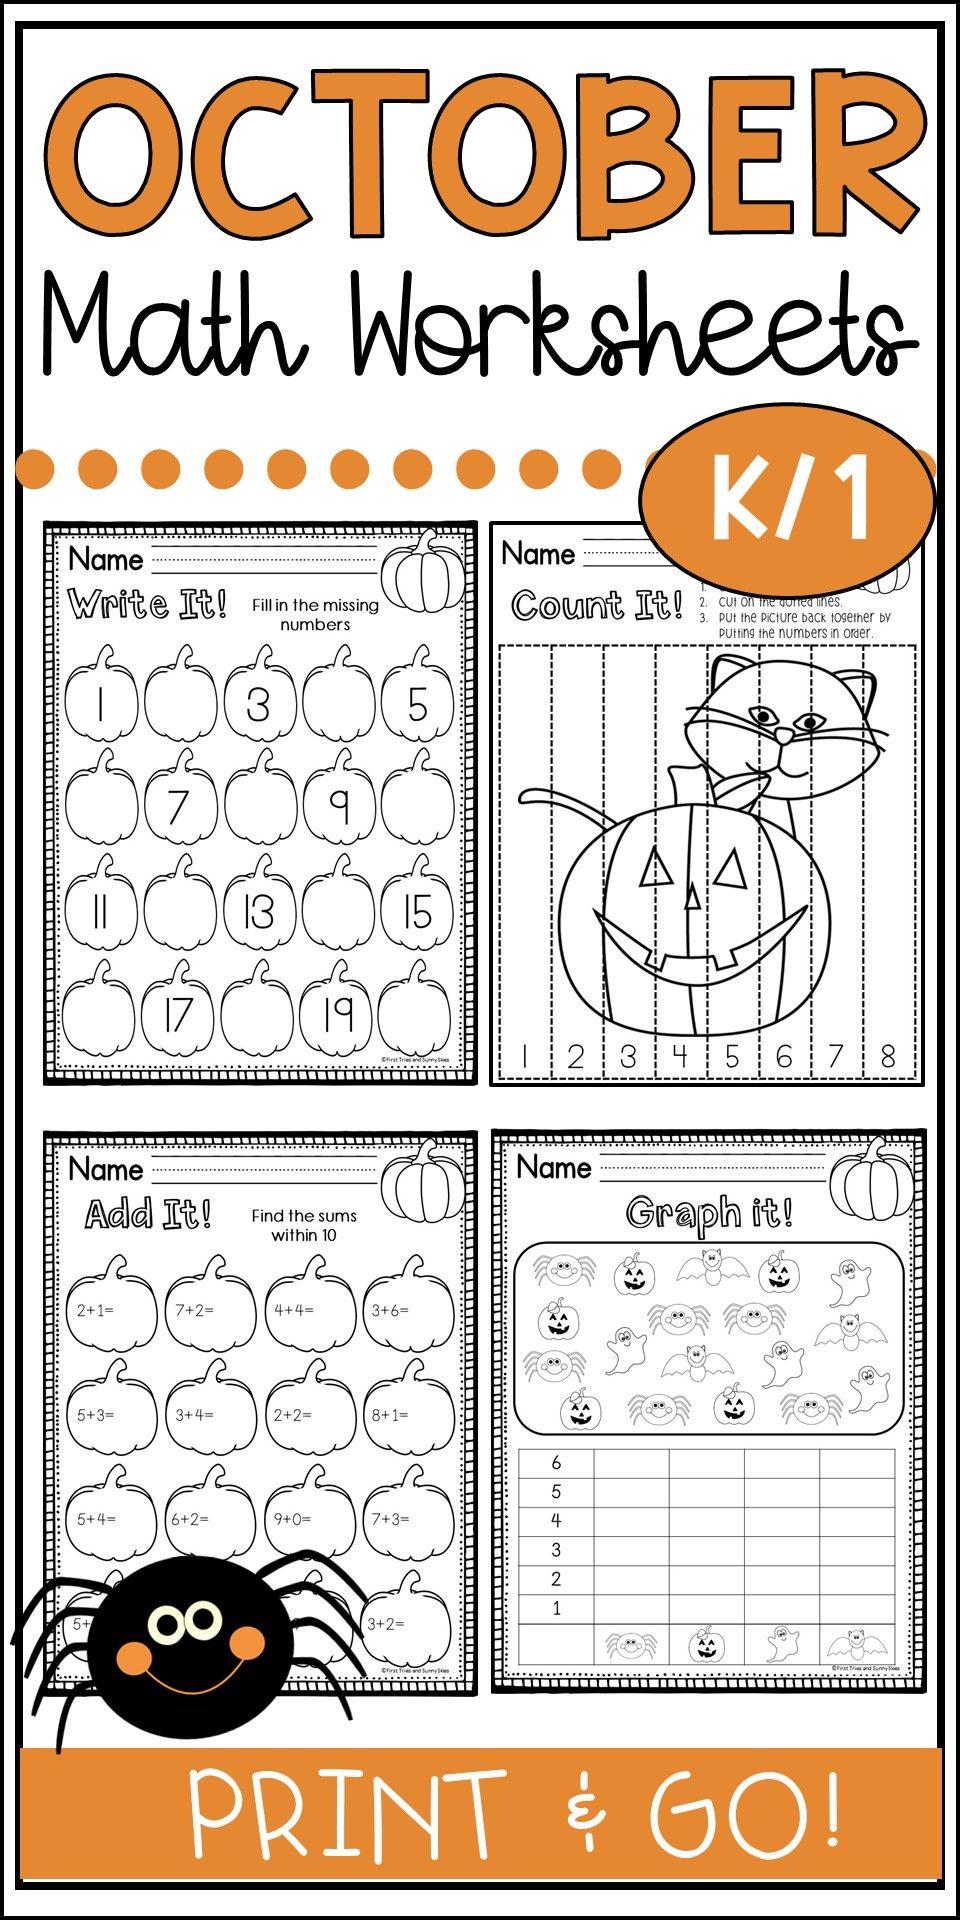 October Math Worksheets Halloween Math Worksheets October Math Halloween Math Activities Halloween addition worksheets first